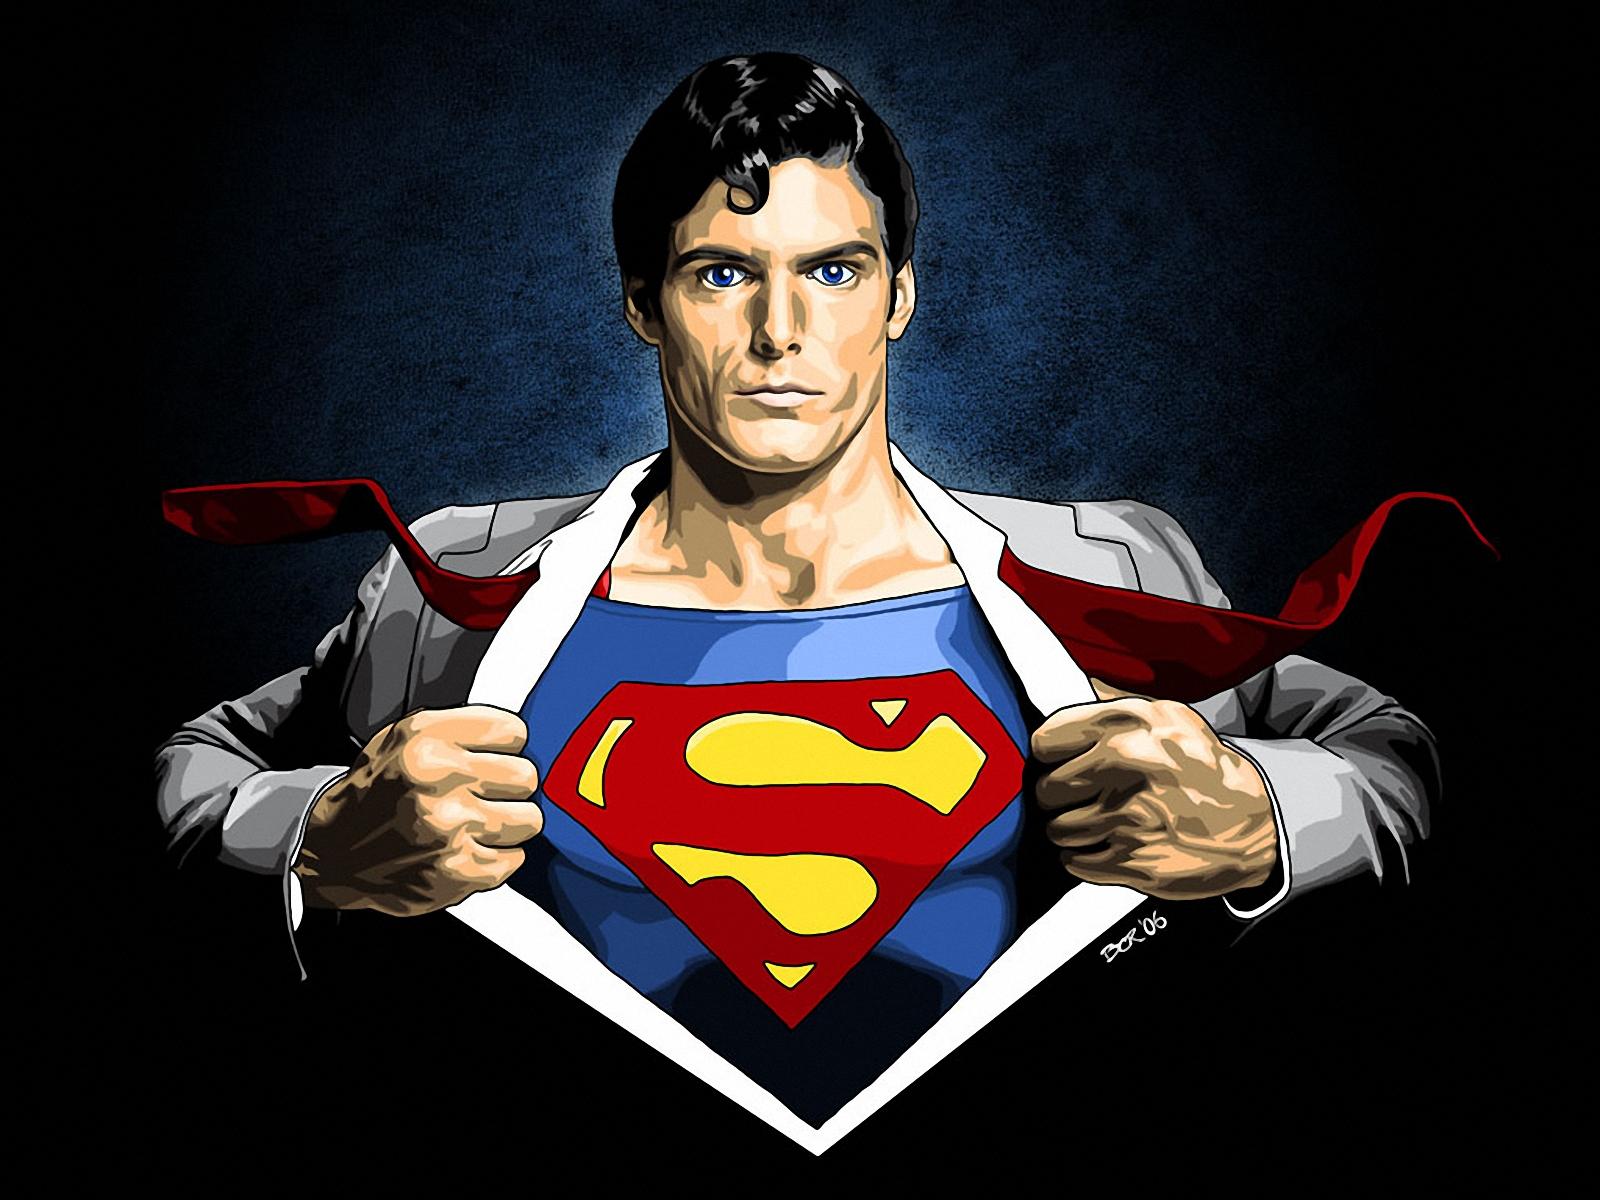 Супермужчина для суперженщины